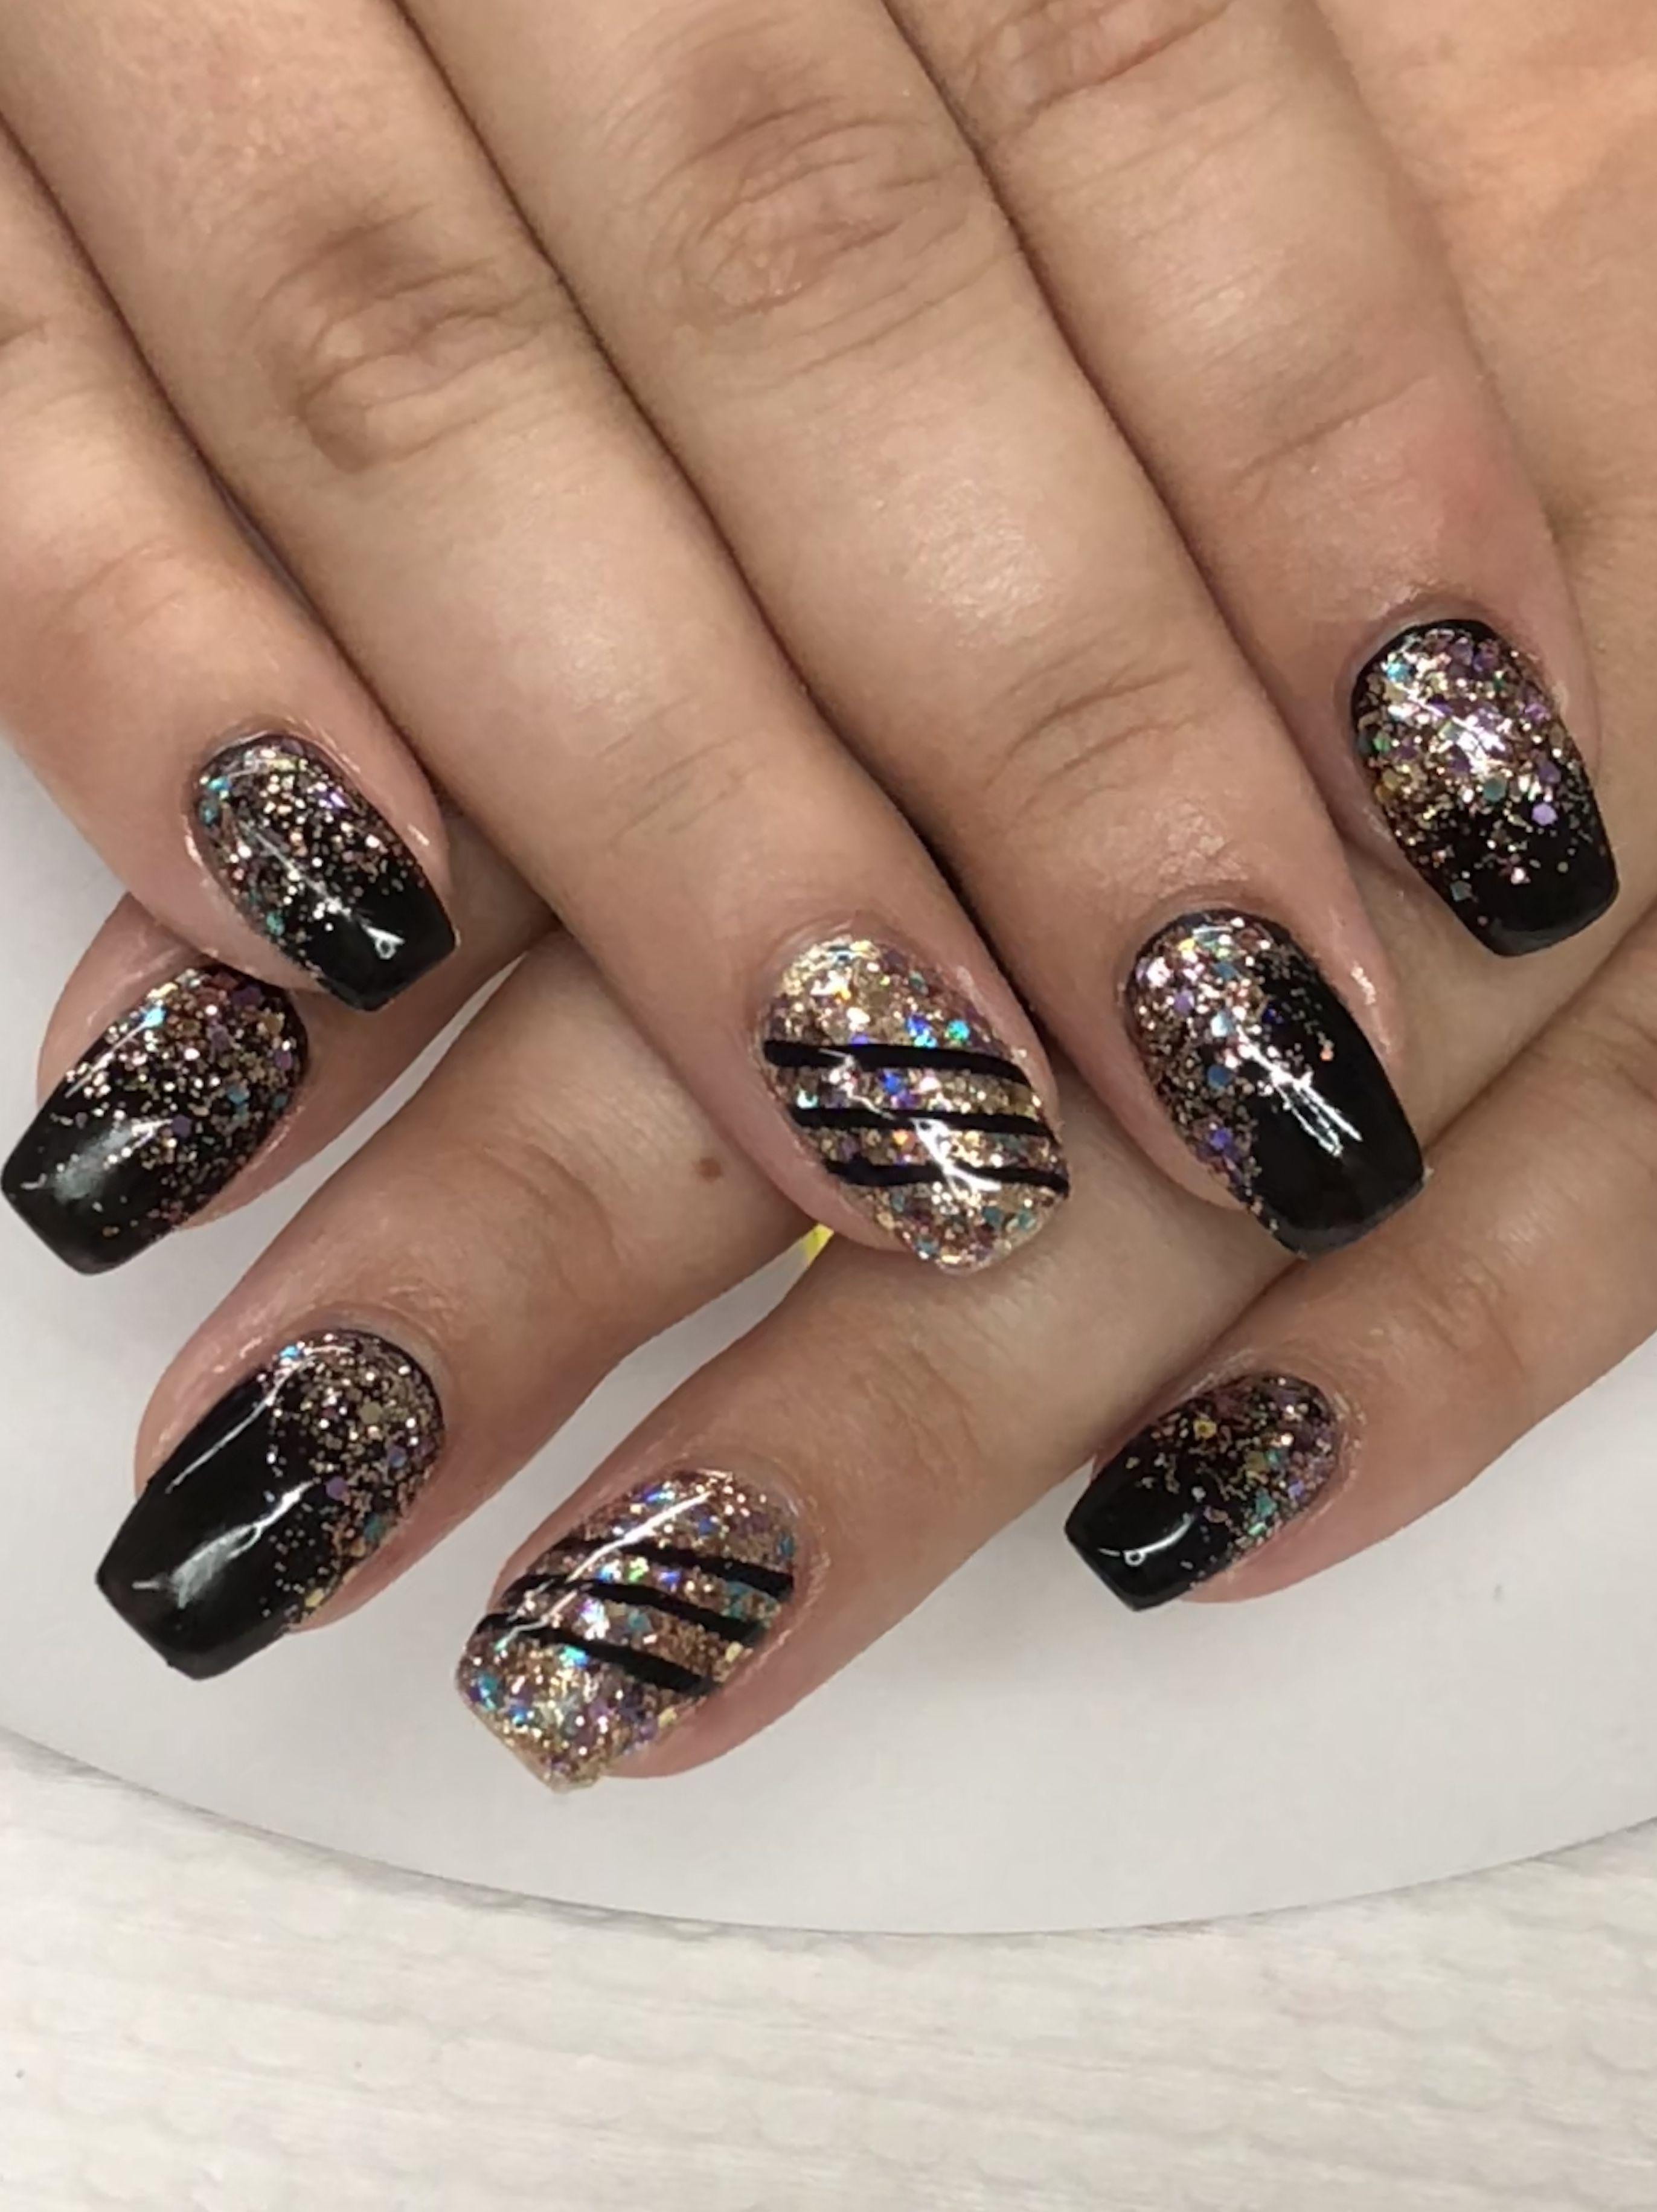 Mini Coffin Black Champagne Gold Glitter Ombre Edgy Gel Nails Light Elegance Black Tie Champagne Gel Nail Light Gel Nails Nail Designs Glitter